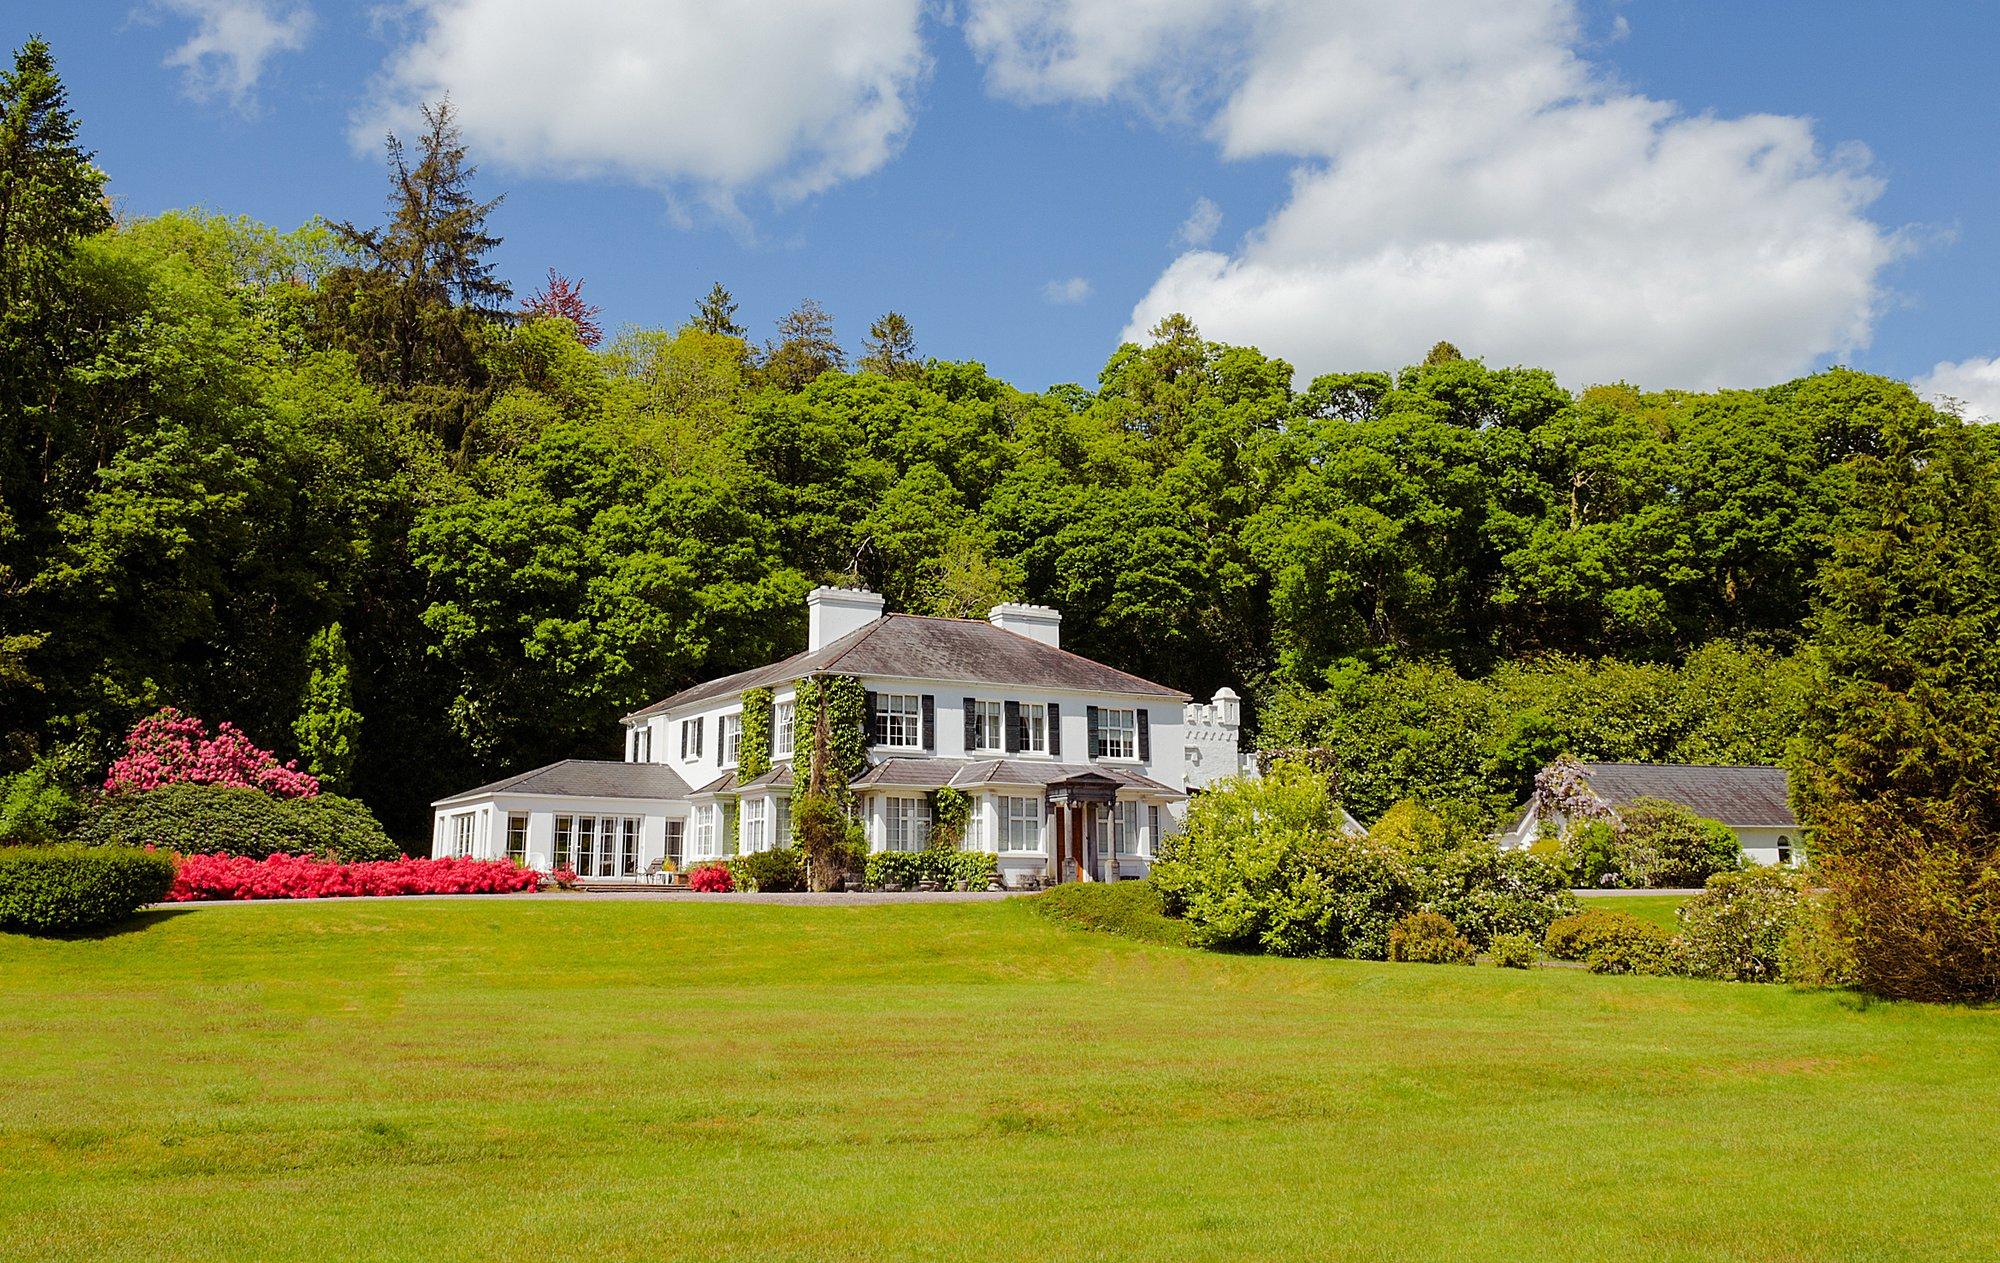 County Cork, Ireland 1 - 11052520